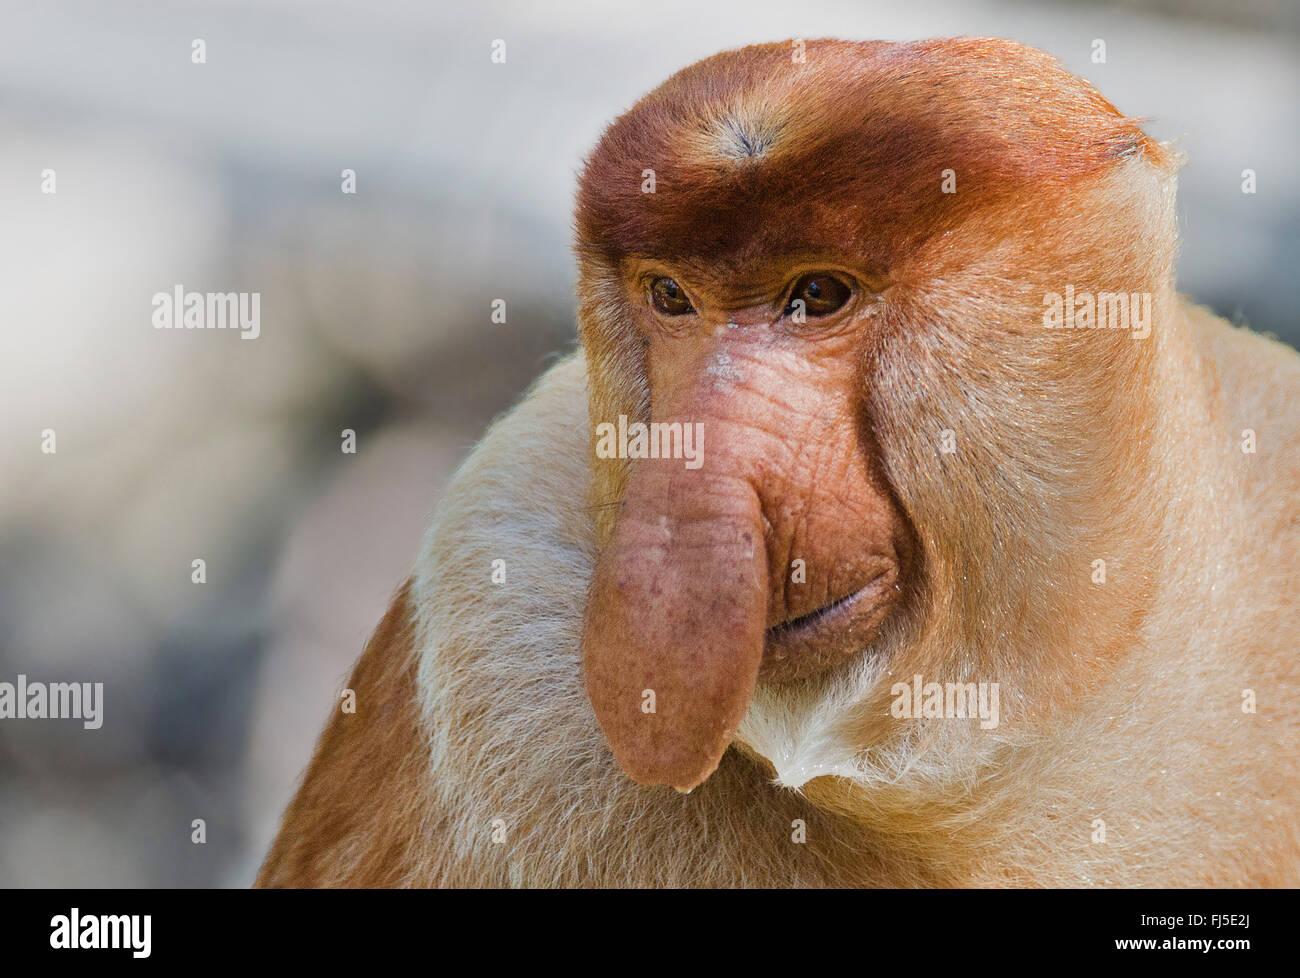 proboscis monkey (Nasalis larvatus), adult male, Malaysia, Borneo, Sabah, Labuk Bay - Stock Image